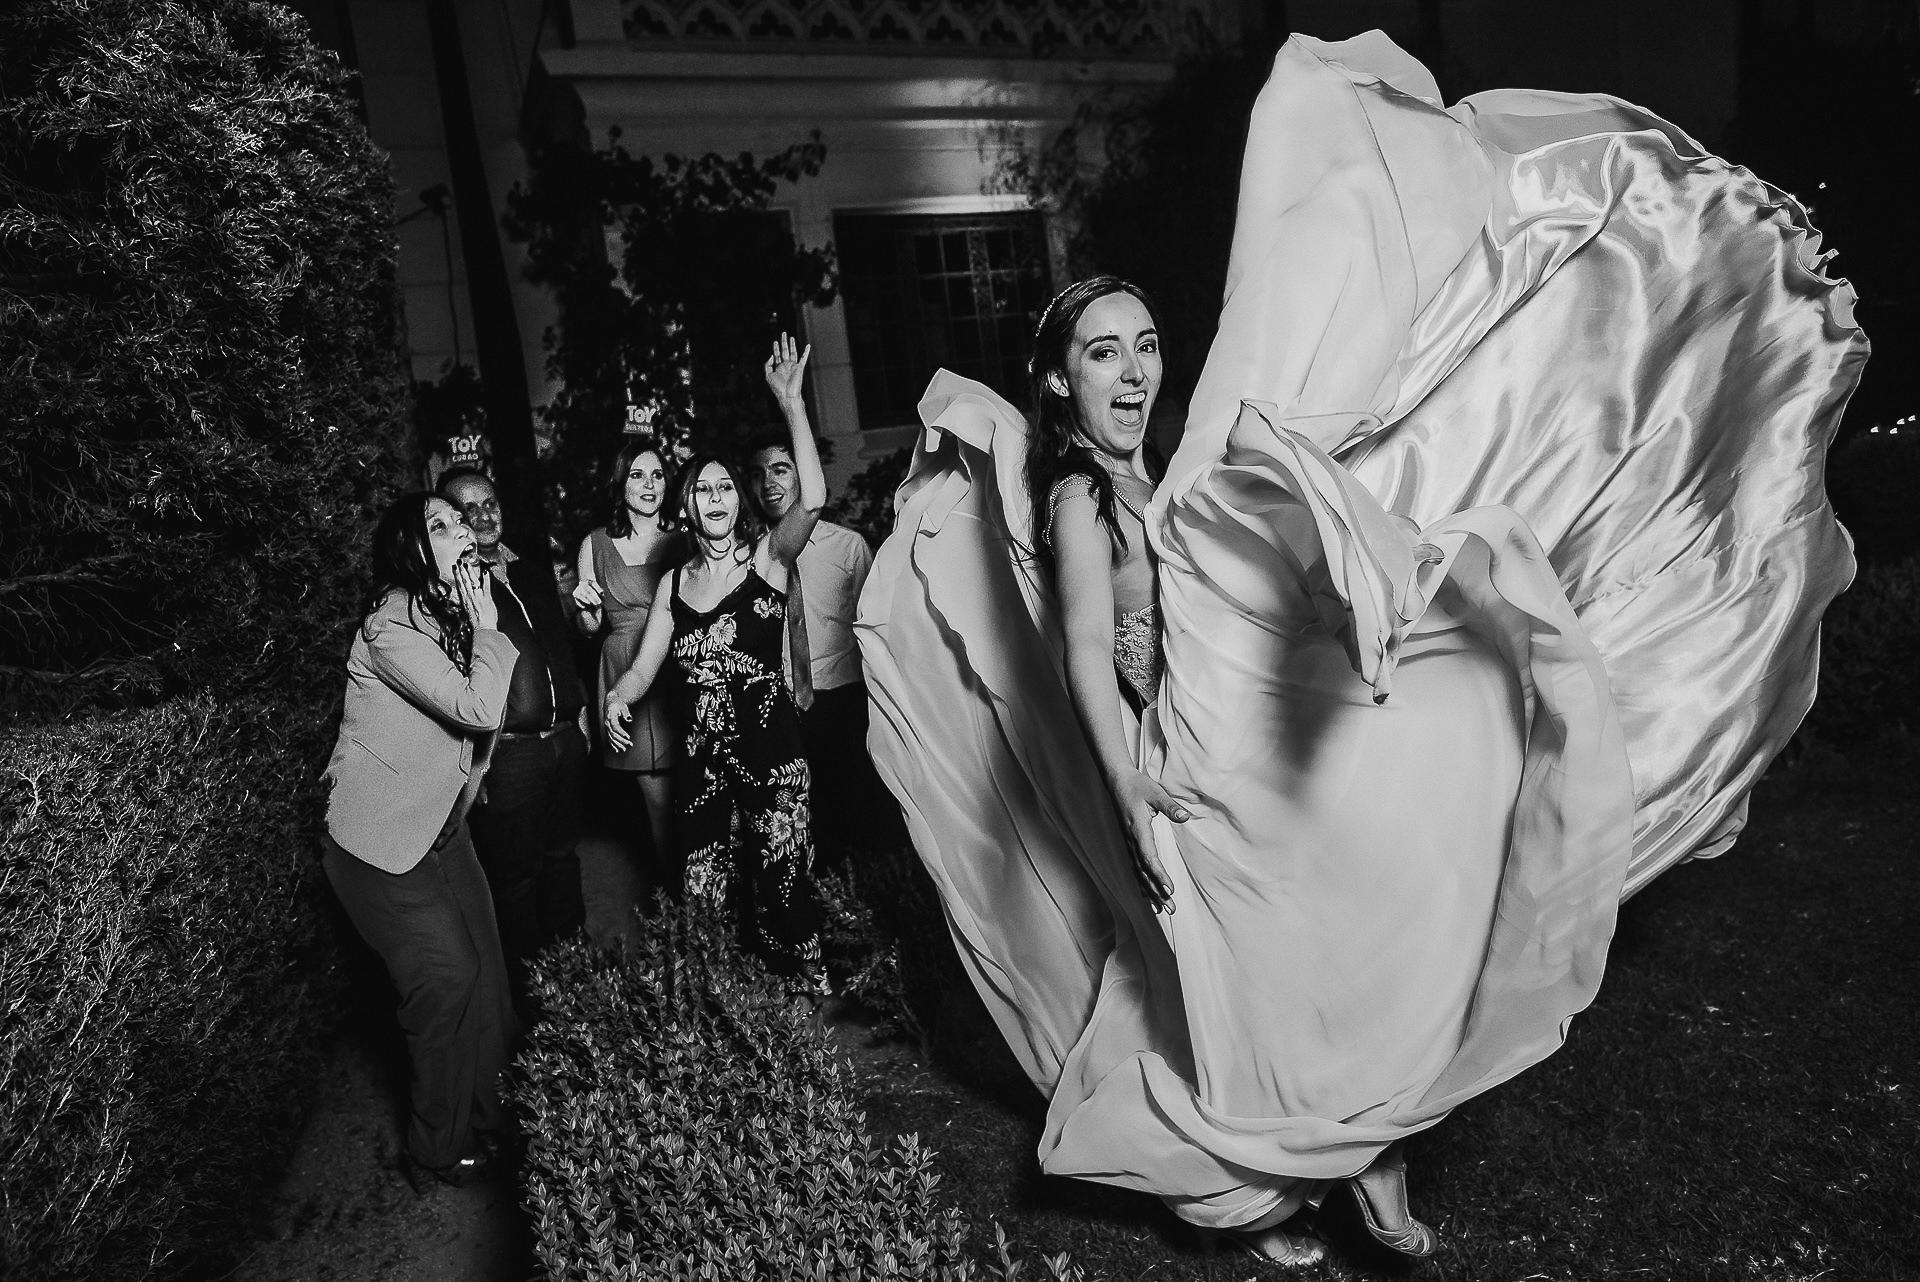 fotografo-matrimonio-fiesta-novios-fotografia-artistica